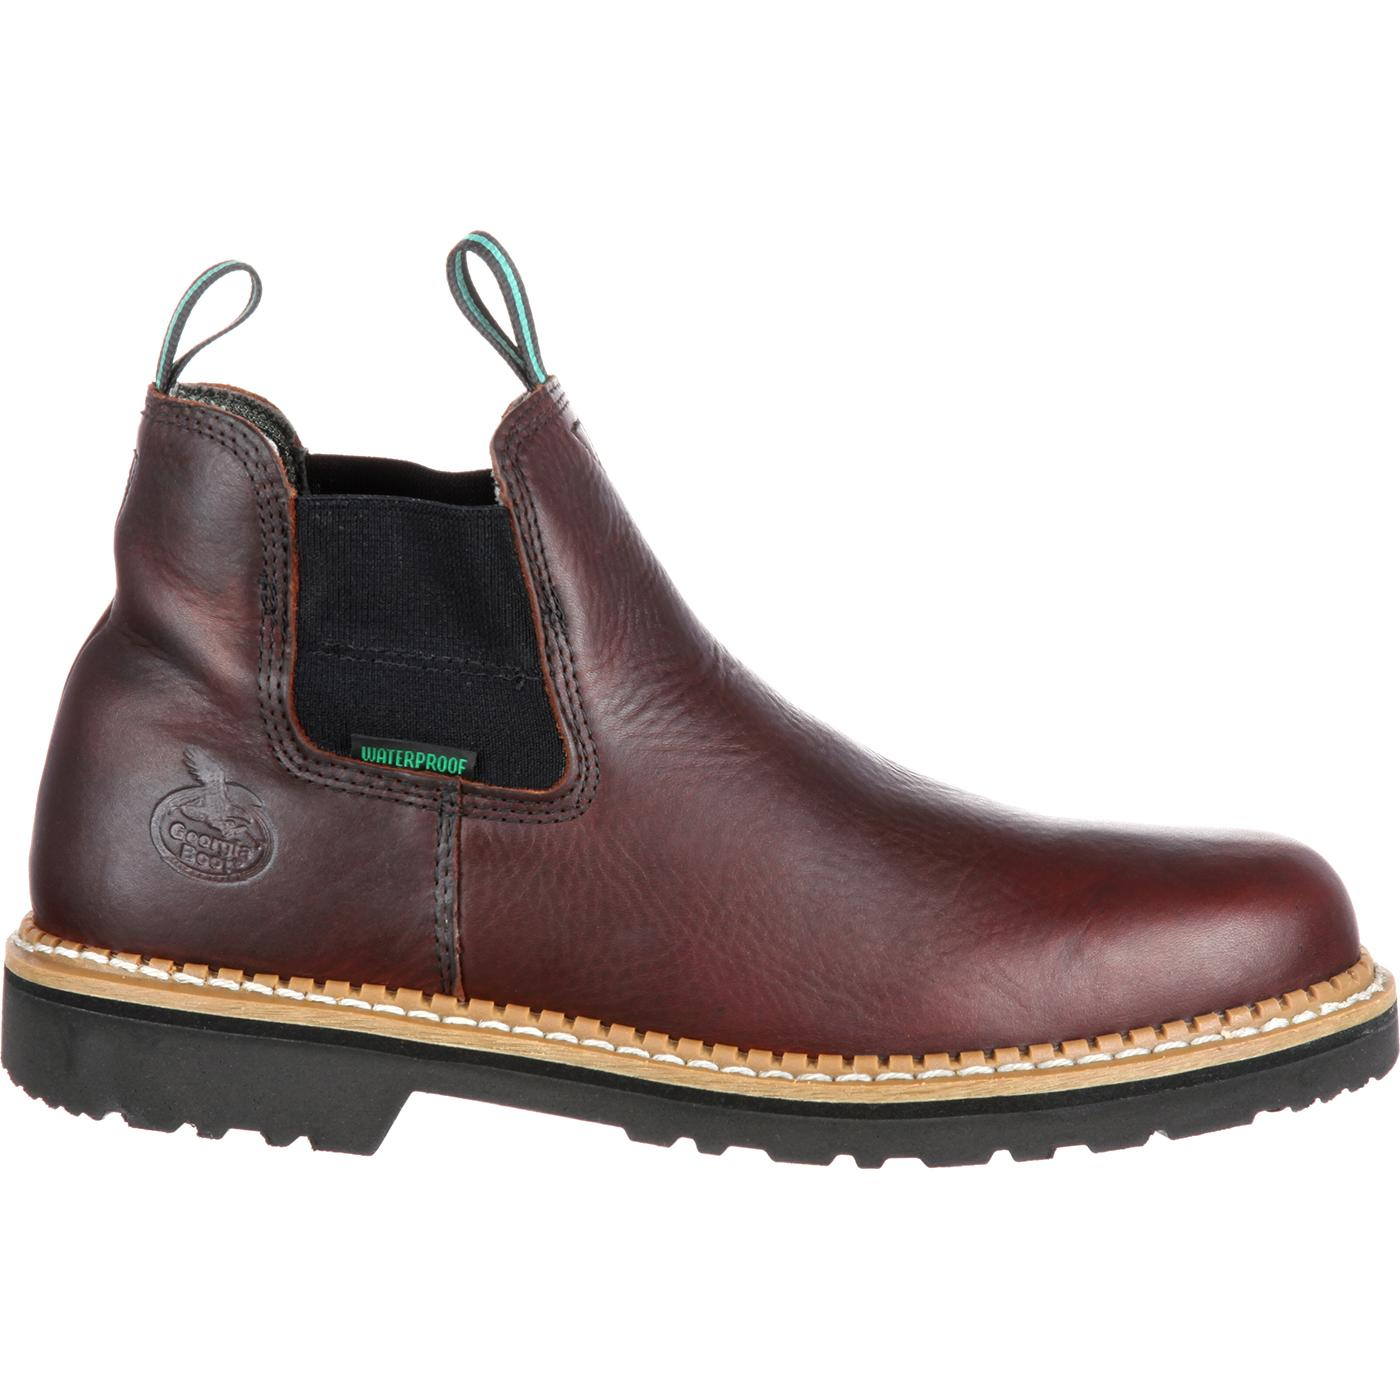 aa9e2a3d33b Georgia Giant Waterproof High Romeo Boot